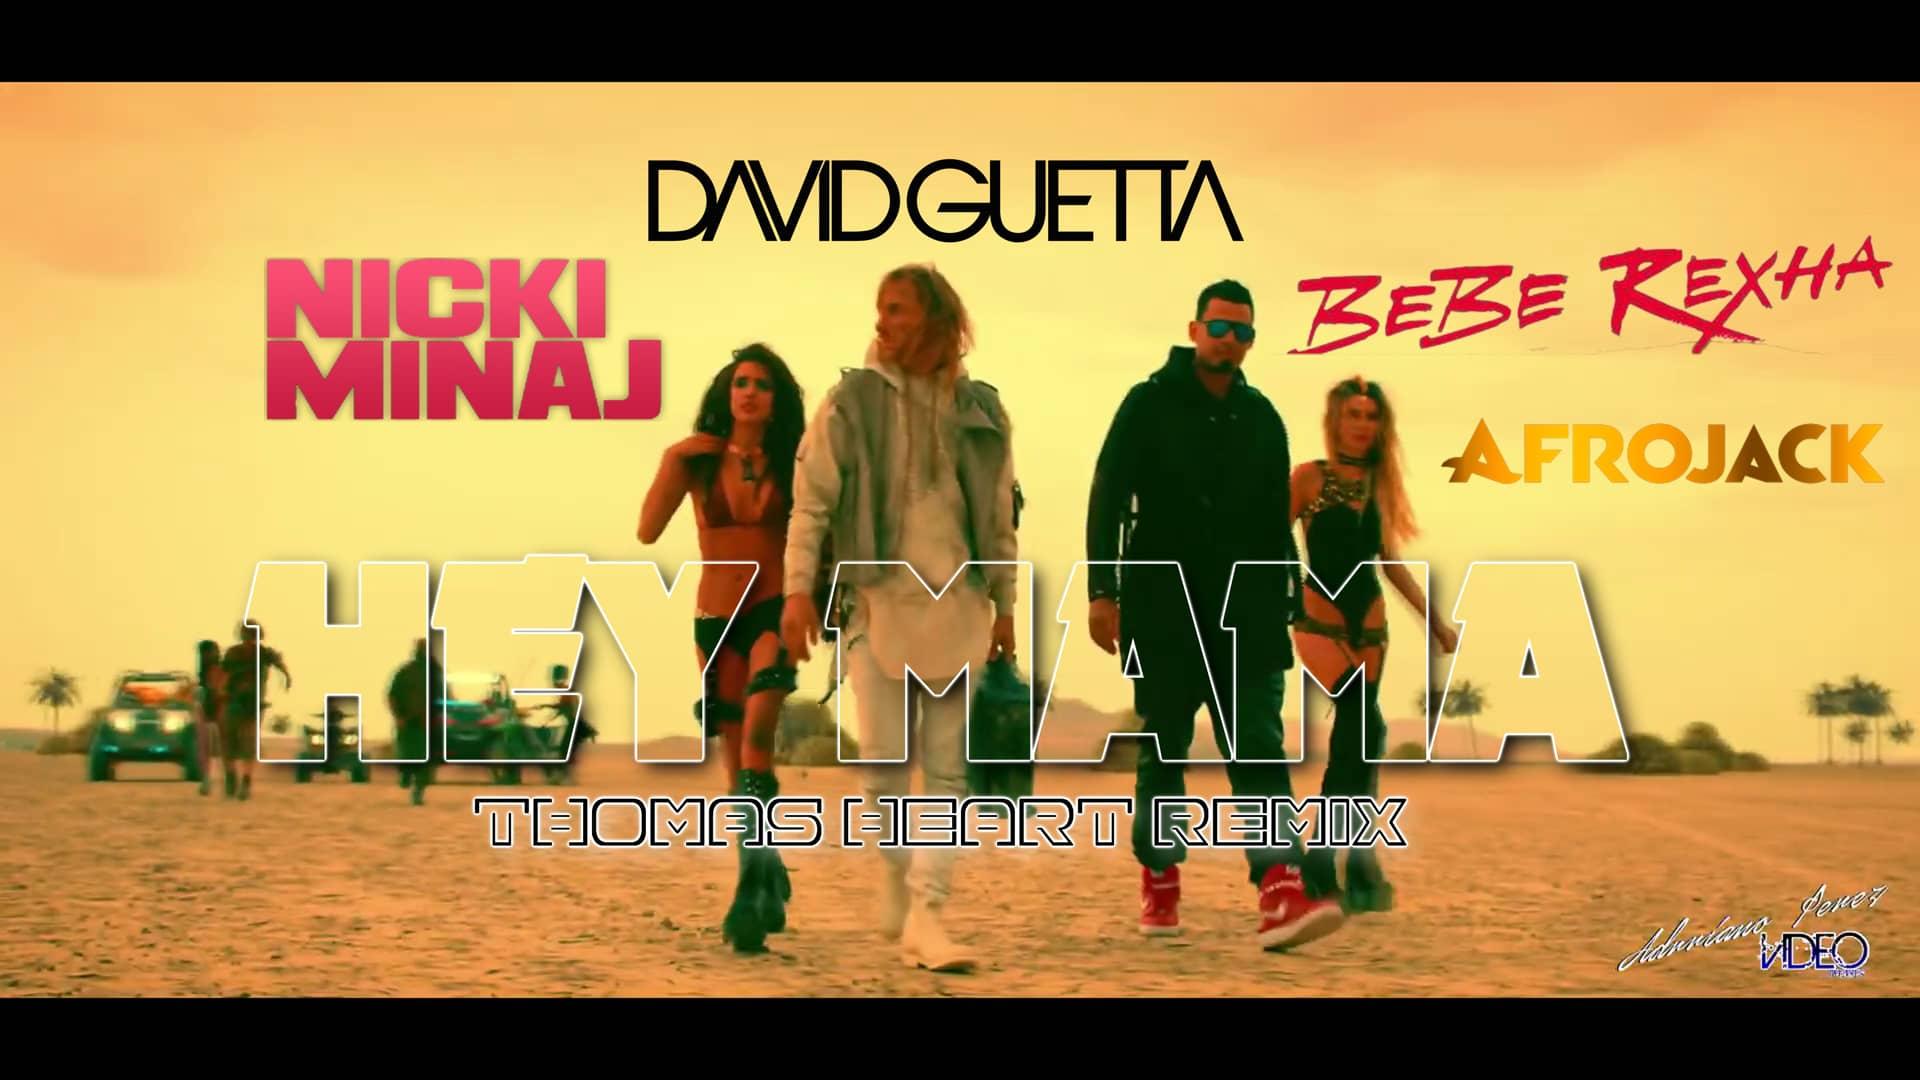 David Guetta Feat Nicki Minaj Afrojack – Hey Mama